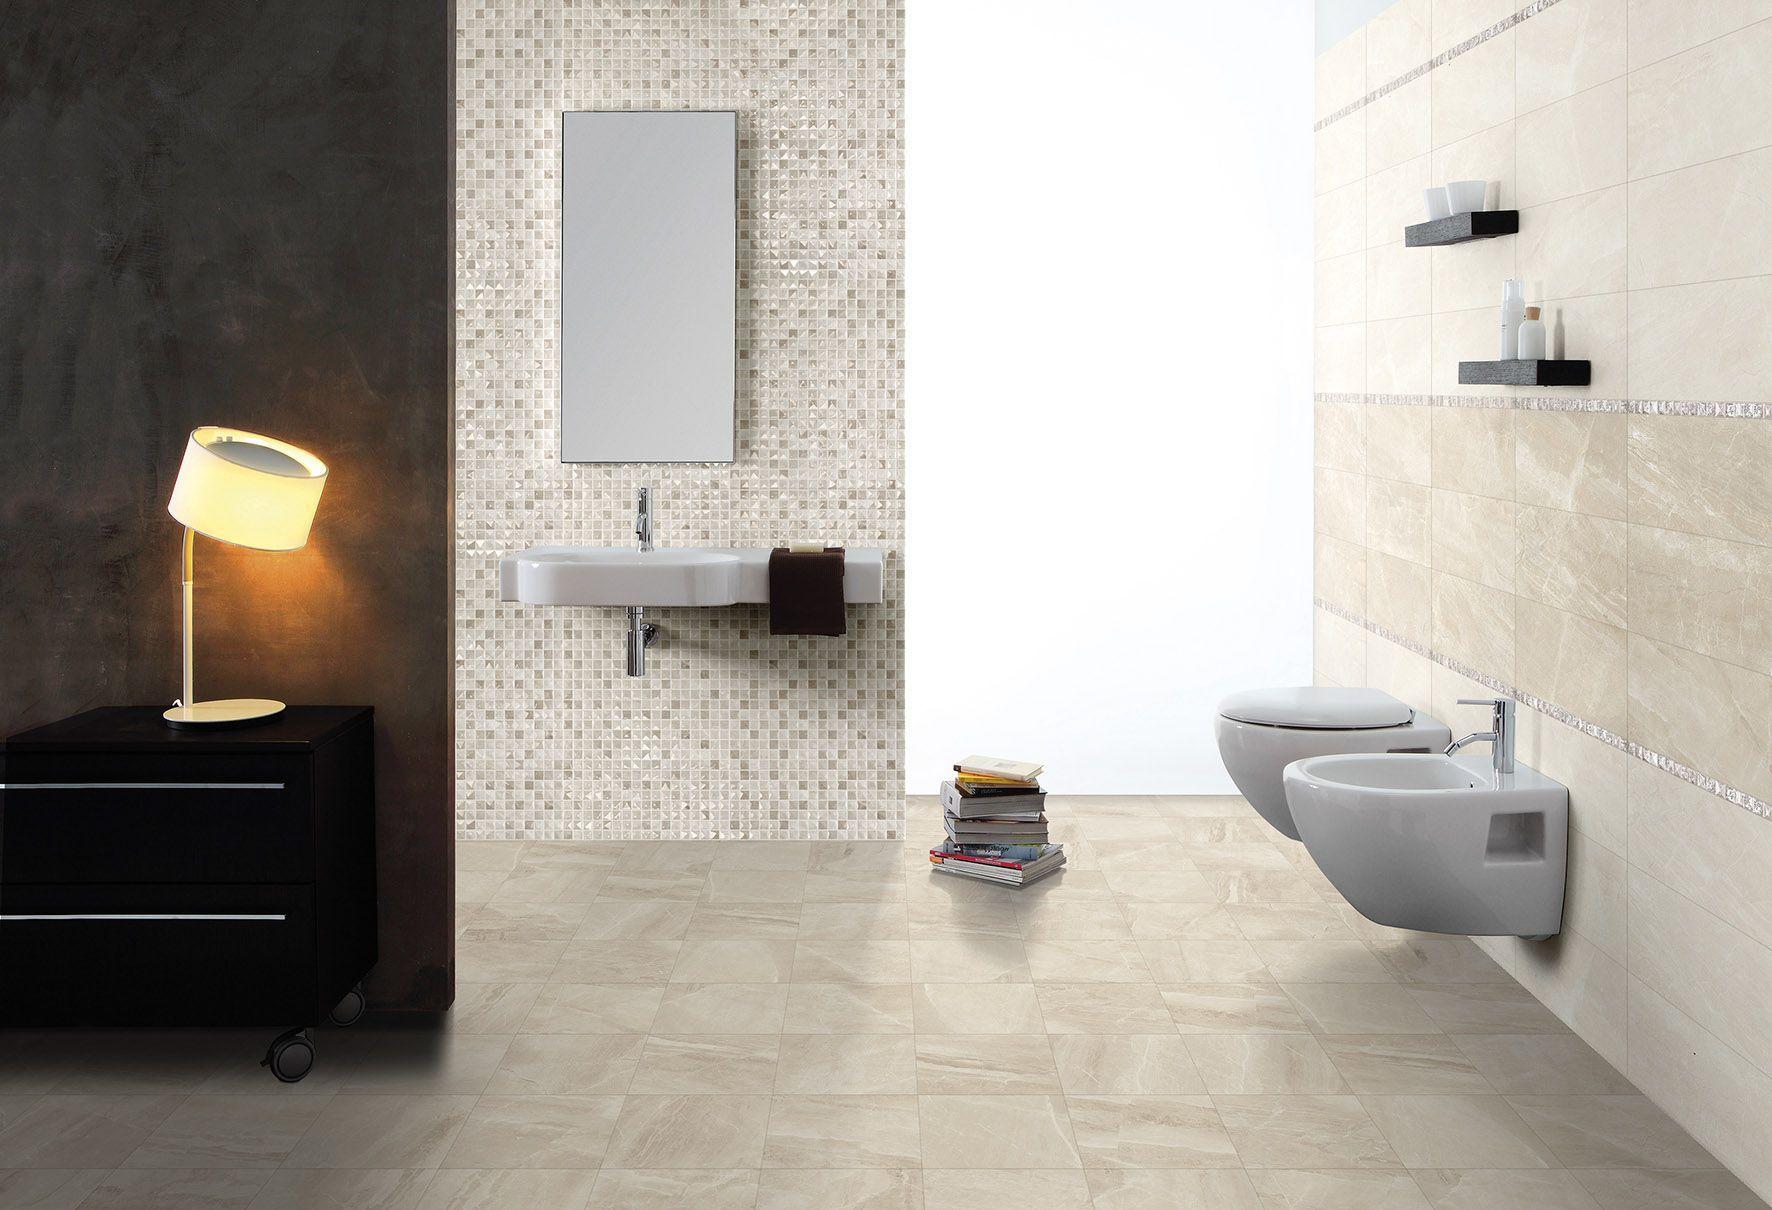 Indoor tile / wall / floor / porcelain stoneware - MAIN STONE ...